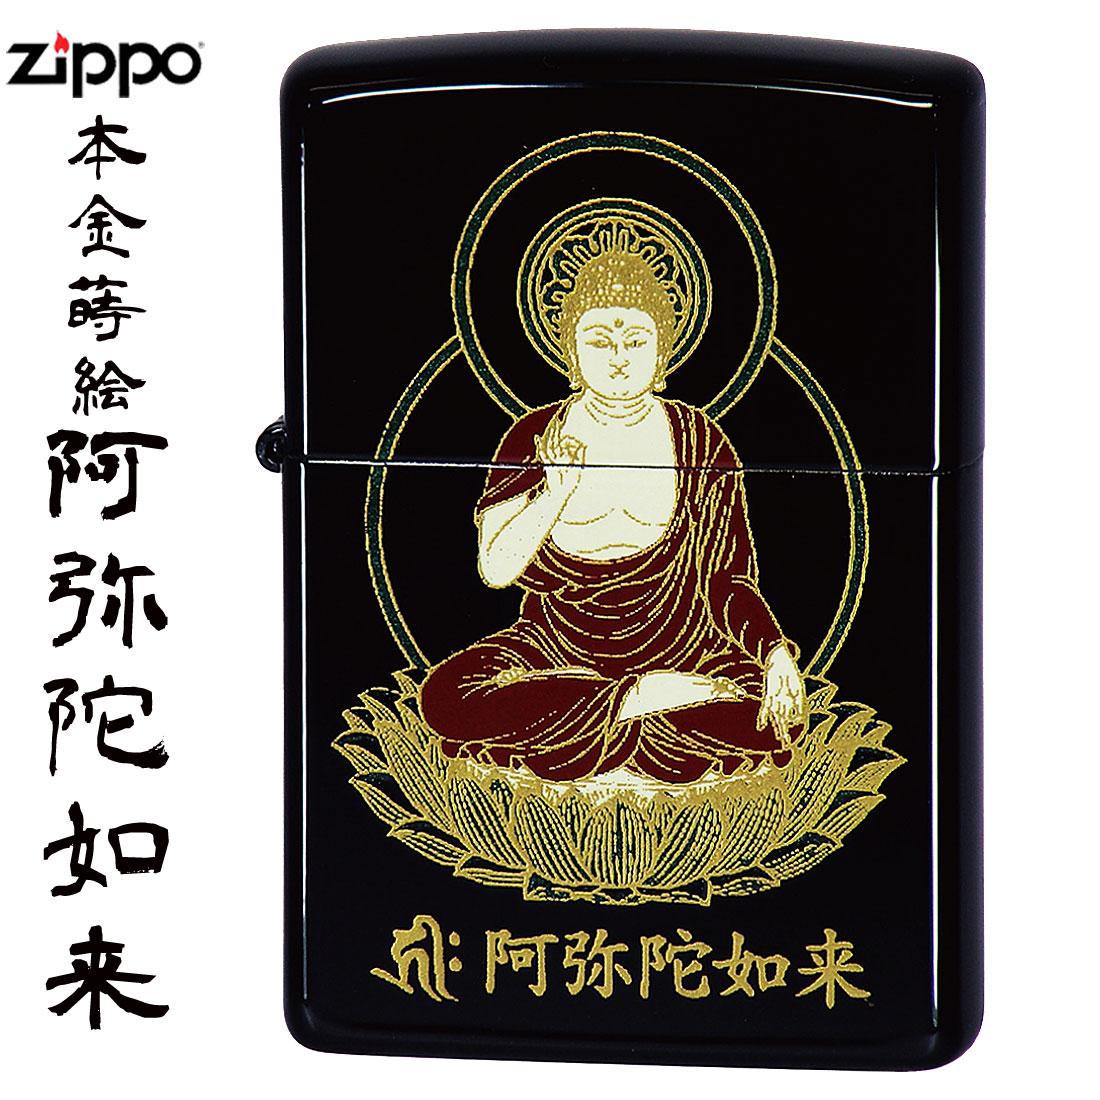 zippo (ジッポーライター)本金蒔絵   阿弥陀如来 漆塗 仏像シリーズ 画像